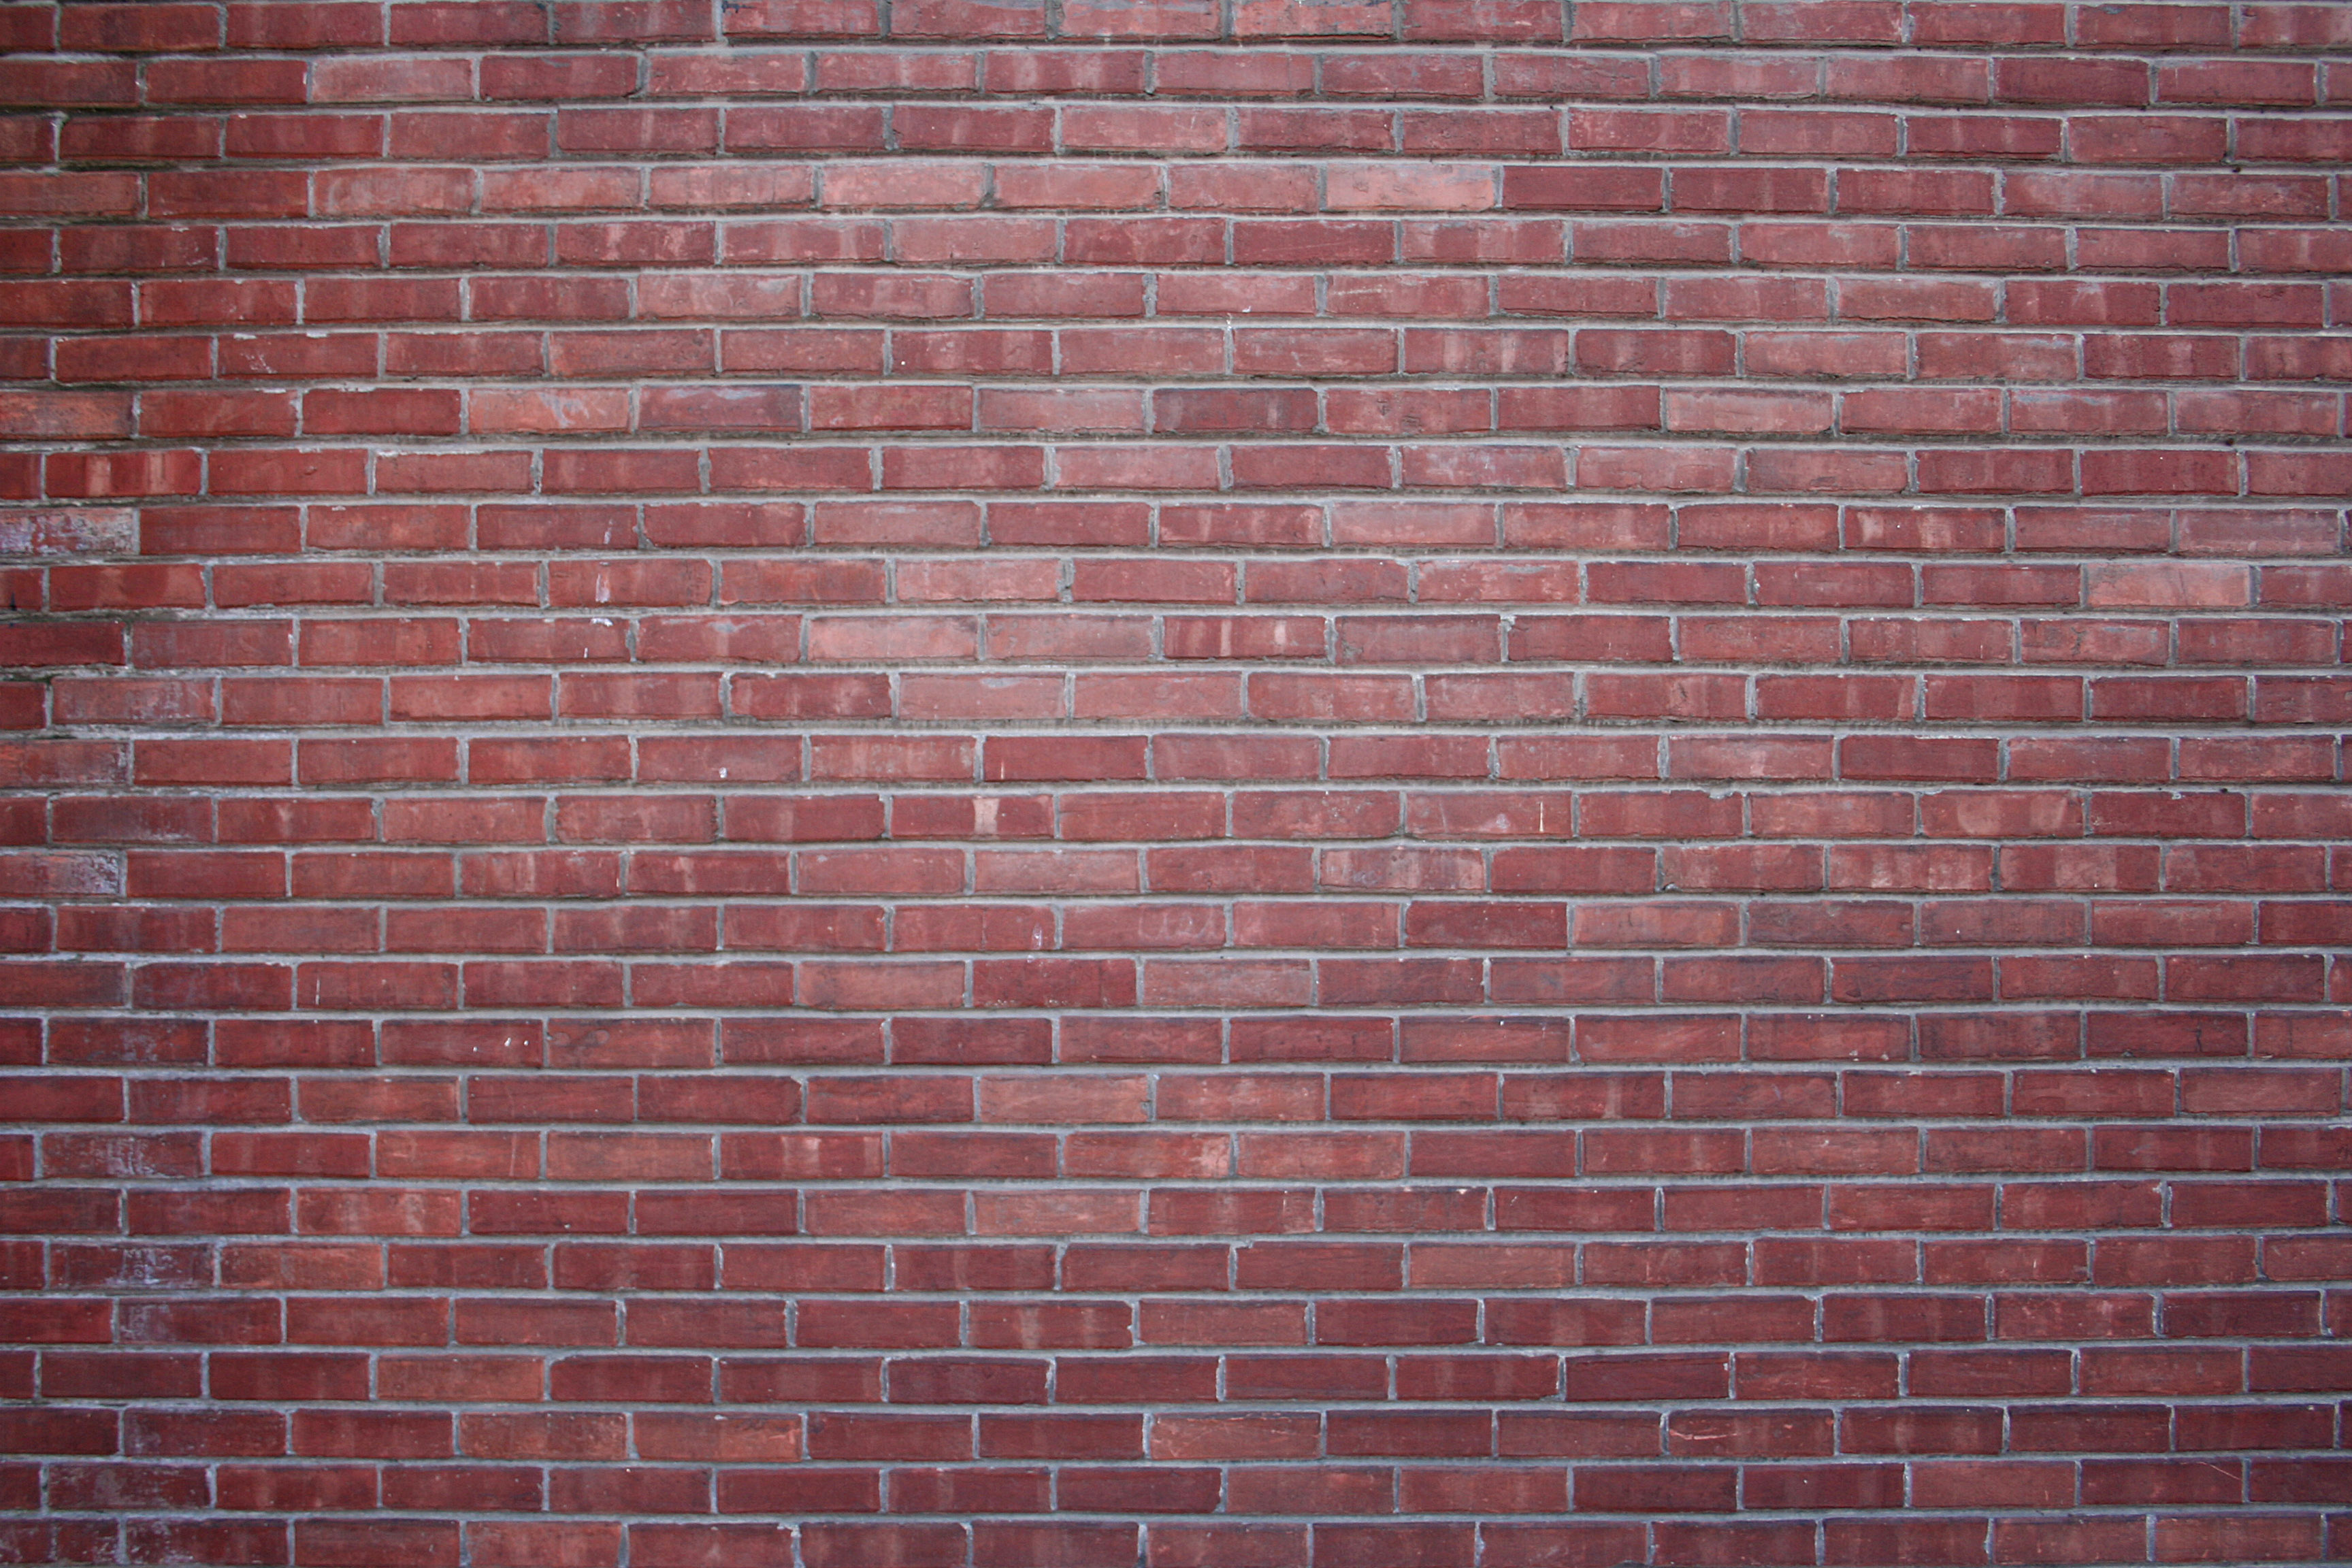 Texturex Red Brick Wall Free Stock Photo Texture - TextureX- Free ...